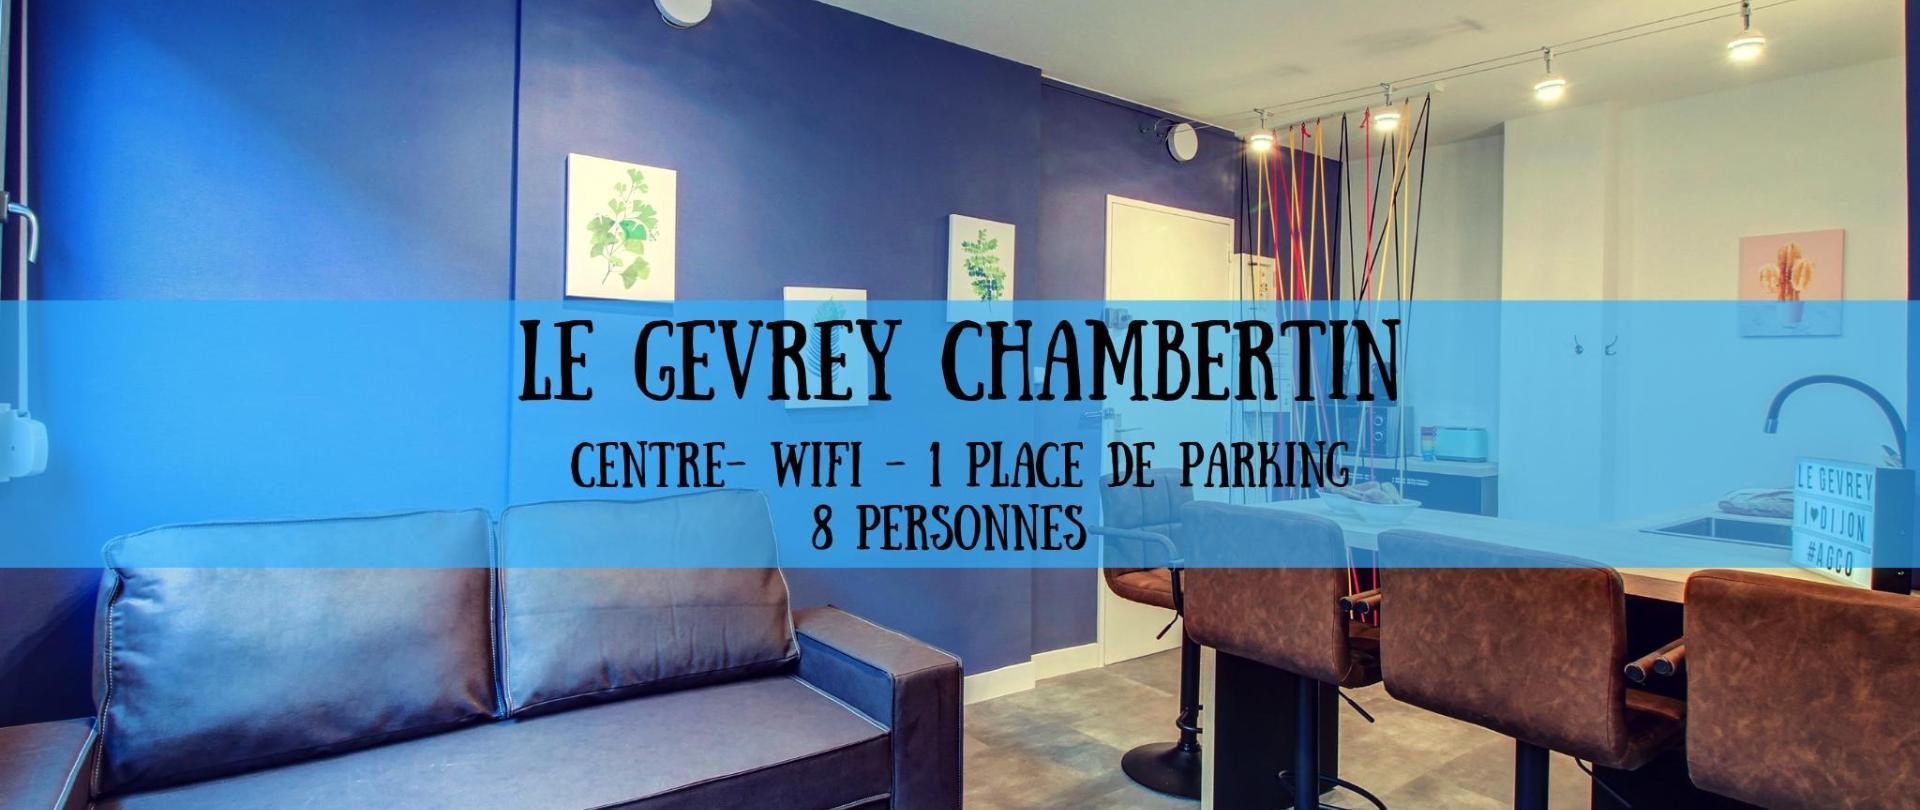 LE GEVREY CHAMBERTIN - LE FORMEL